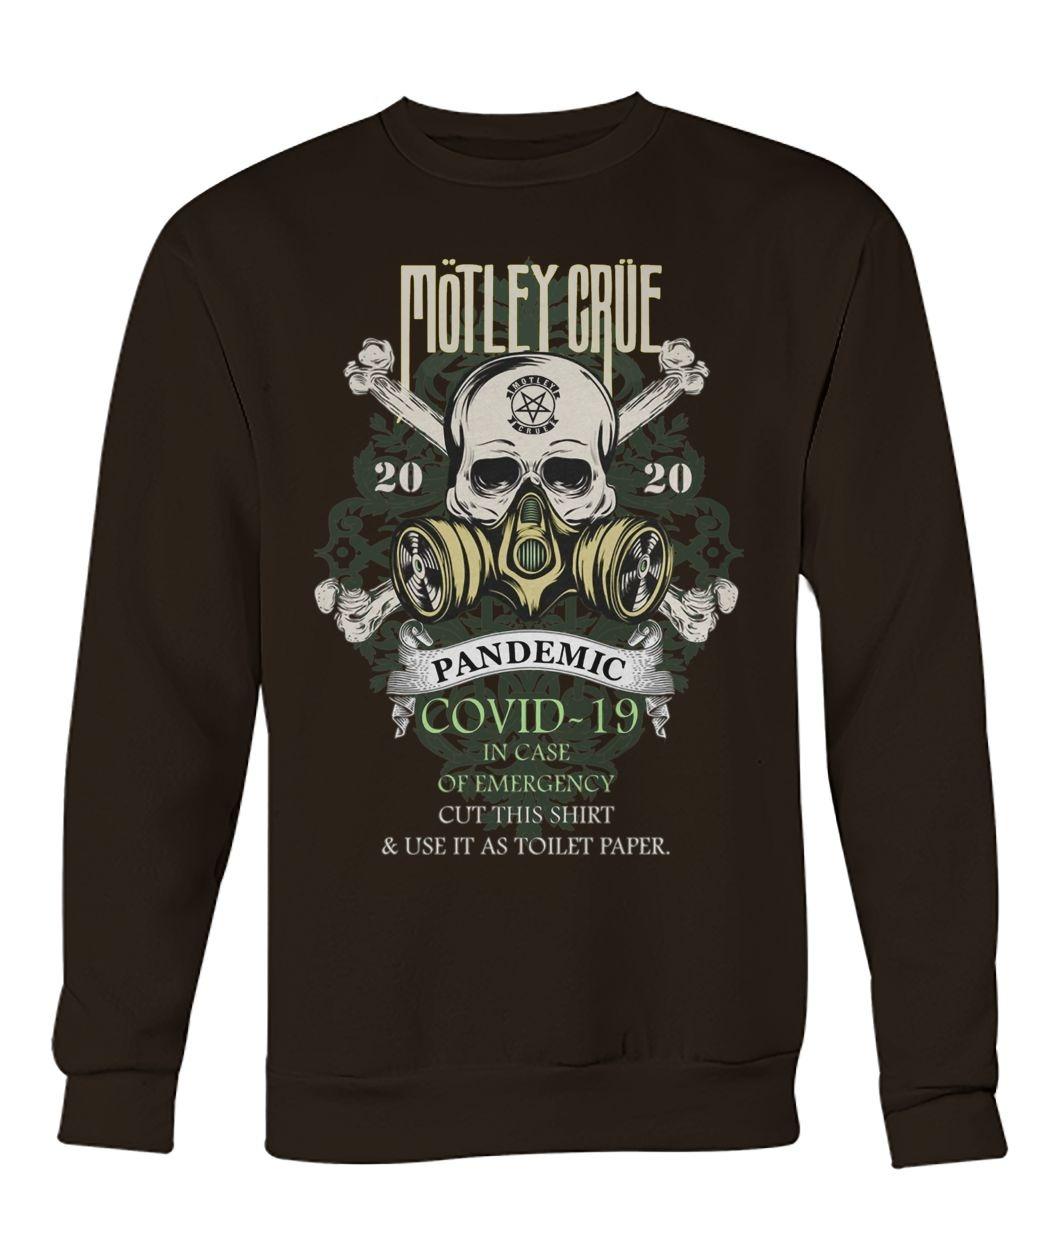 Mötley Crüe 2020 Covid-19 Pandemic Skull Sweatshirt